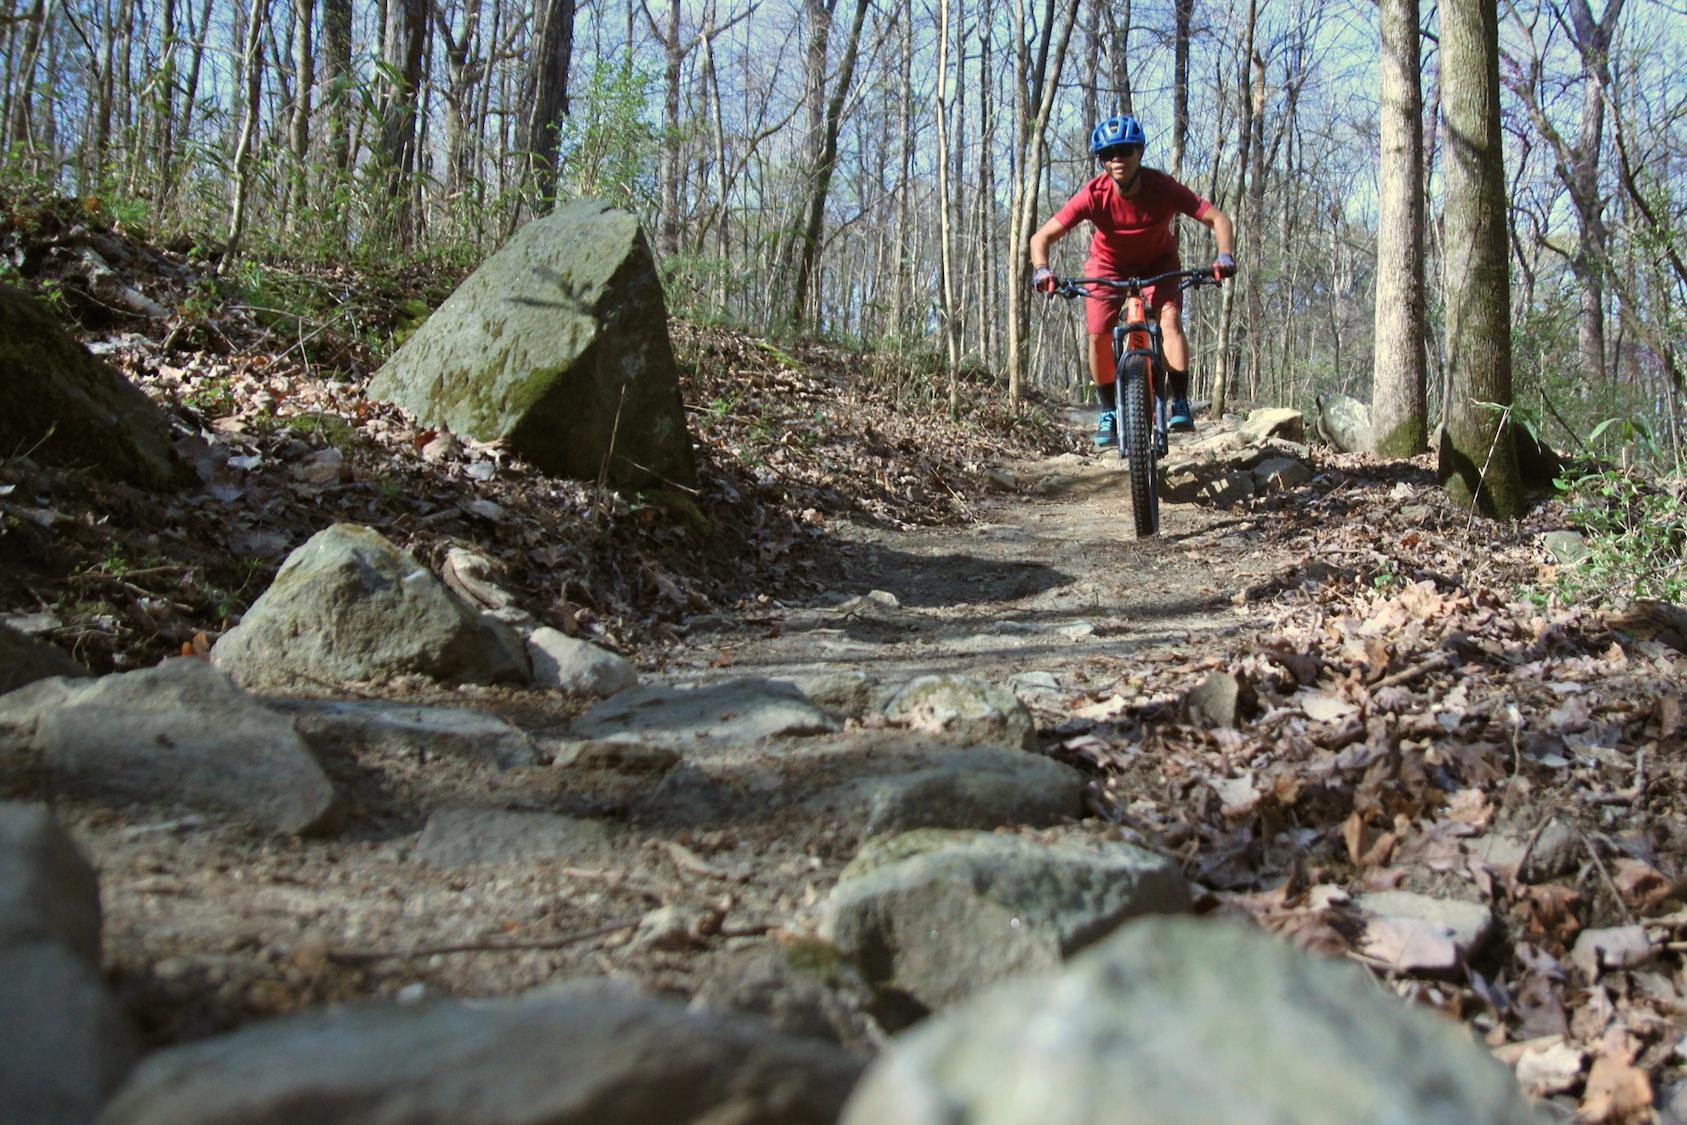 How is Coronavirus Affecting Your Mountain Biking? [Survey] - Singletracks Mountain Bike News